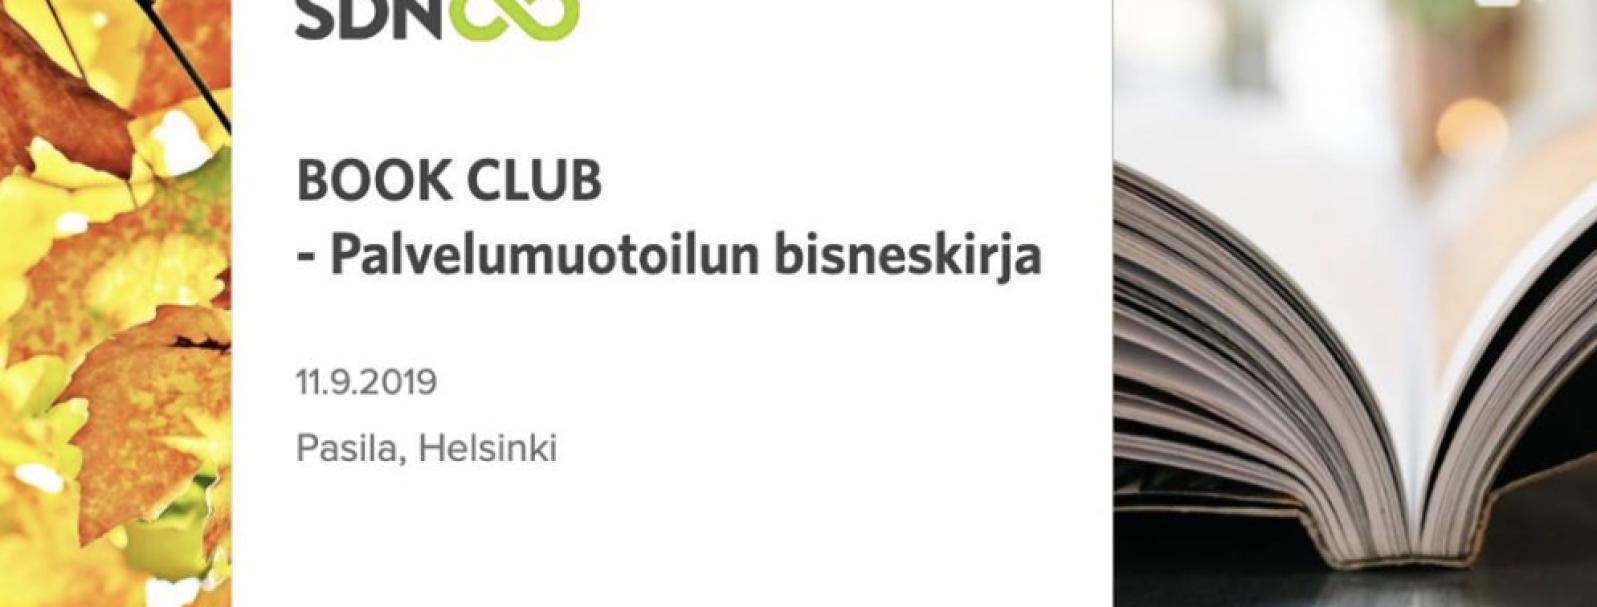 Book Club - Palvelumuotoilun bisneskirja